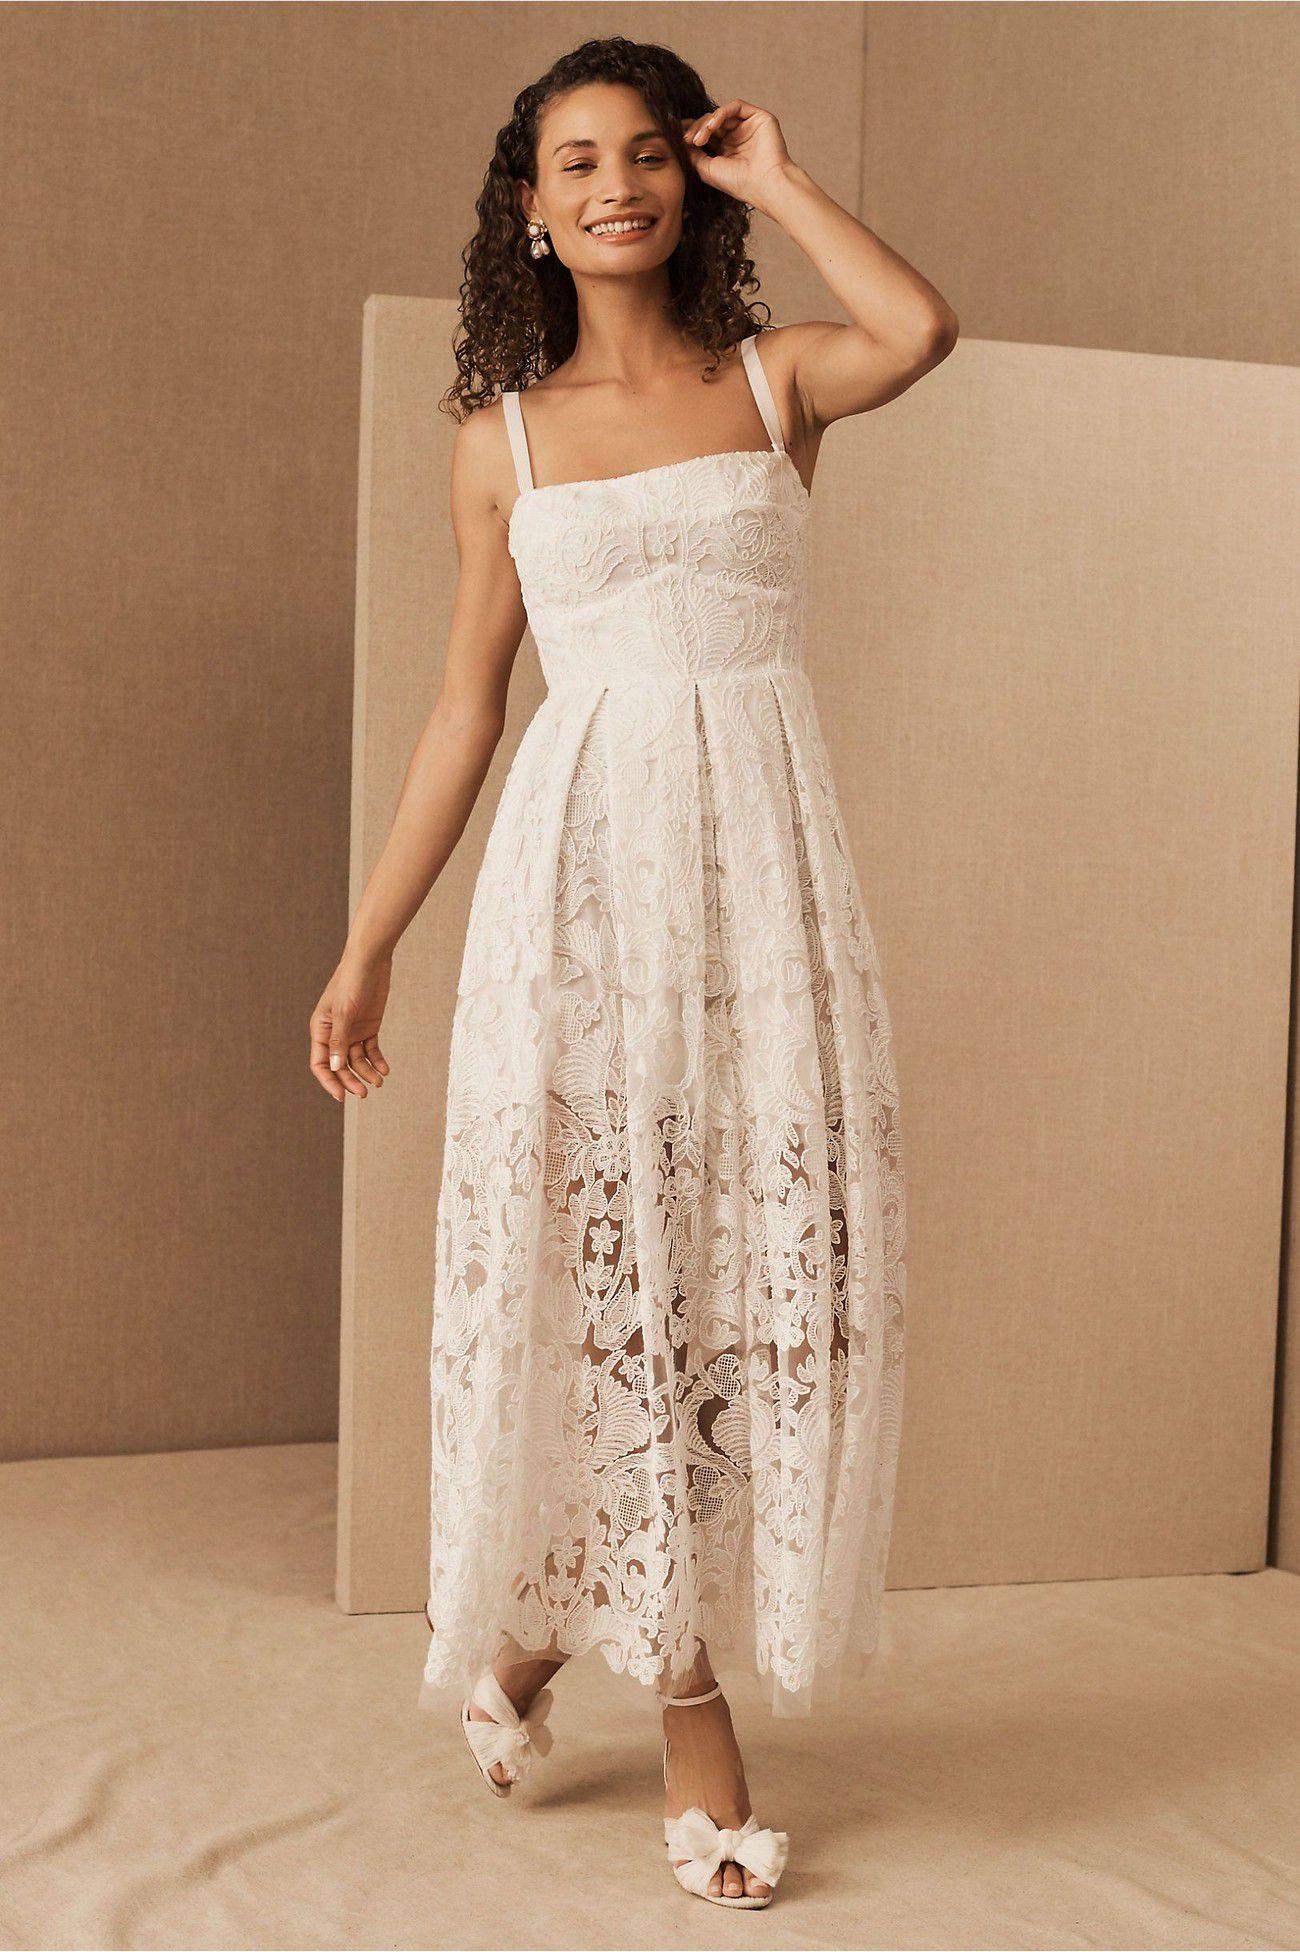 https://greenweddingshoes.com/wp-content/uploads/2020/09/lace-short-wedding-dress.jpeg